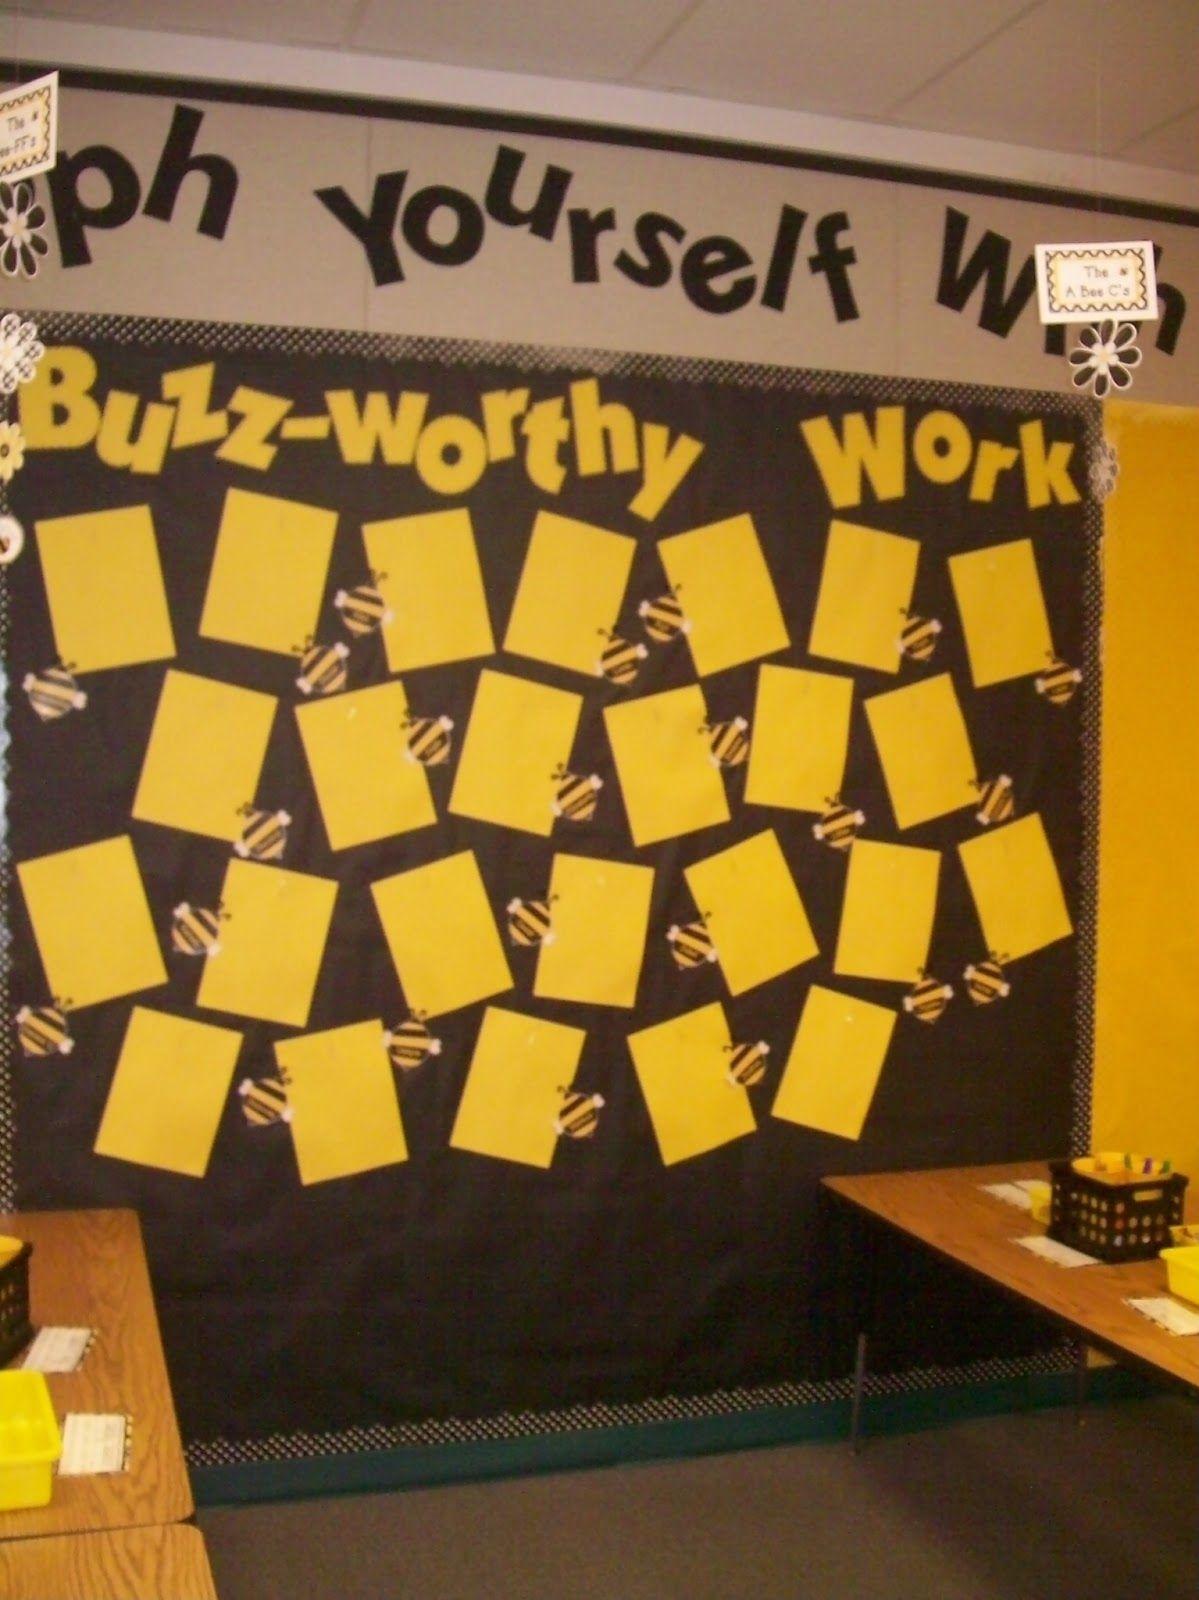 Buzz-worthy work | Teaching Organization & Decorations | Pinterest ...